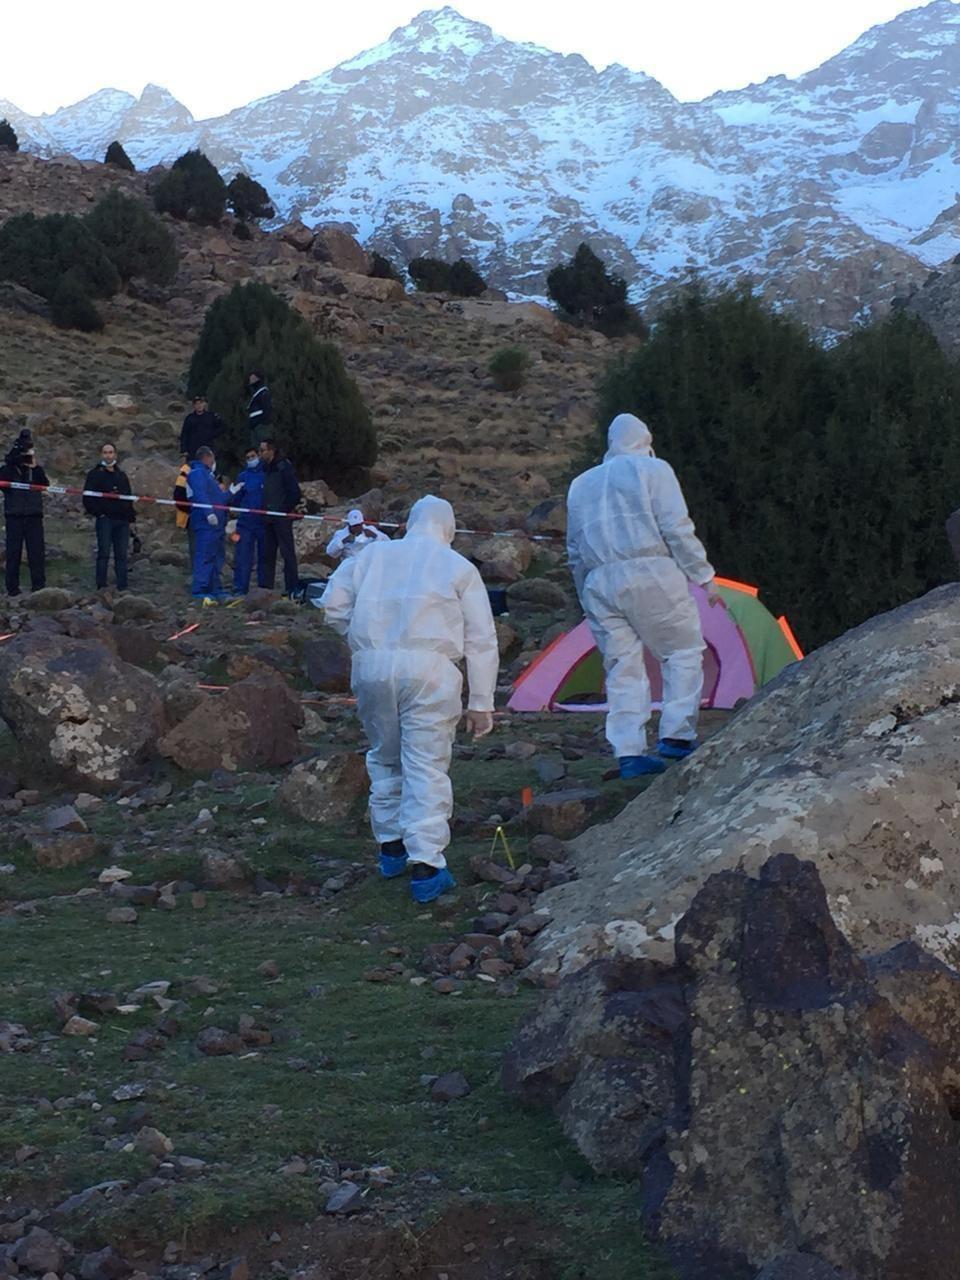 Junge Touristinnen in Marokko getötet